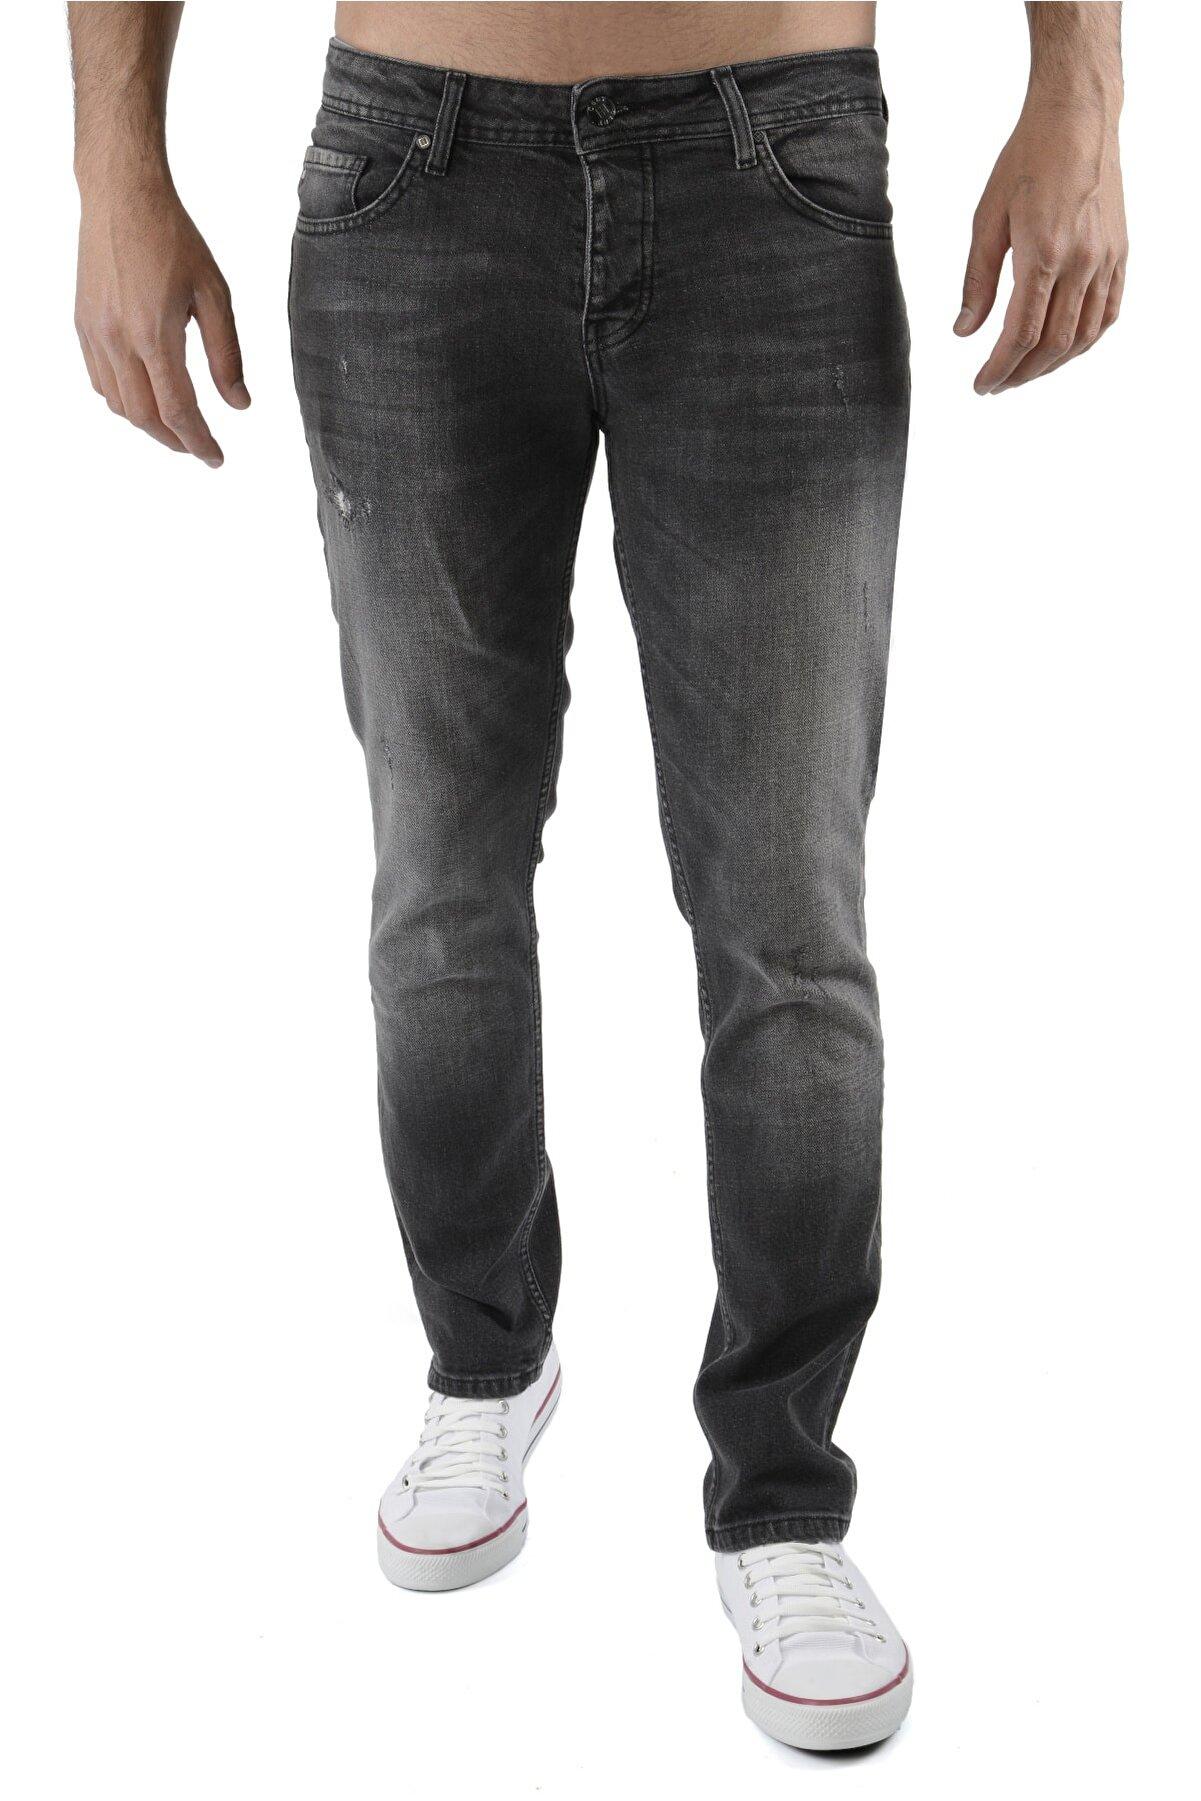 CEDY DENIM Erkek Antrasit Kot Pantolon Slim Fit Jean - C326